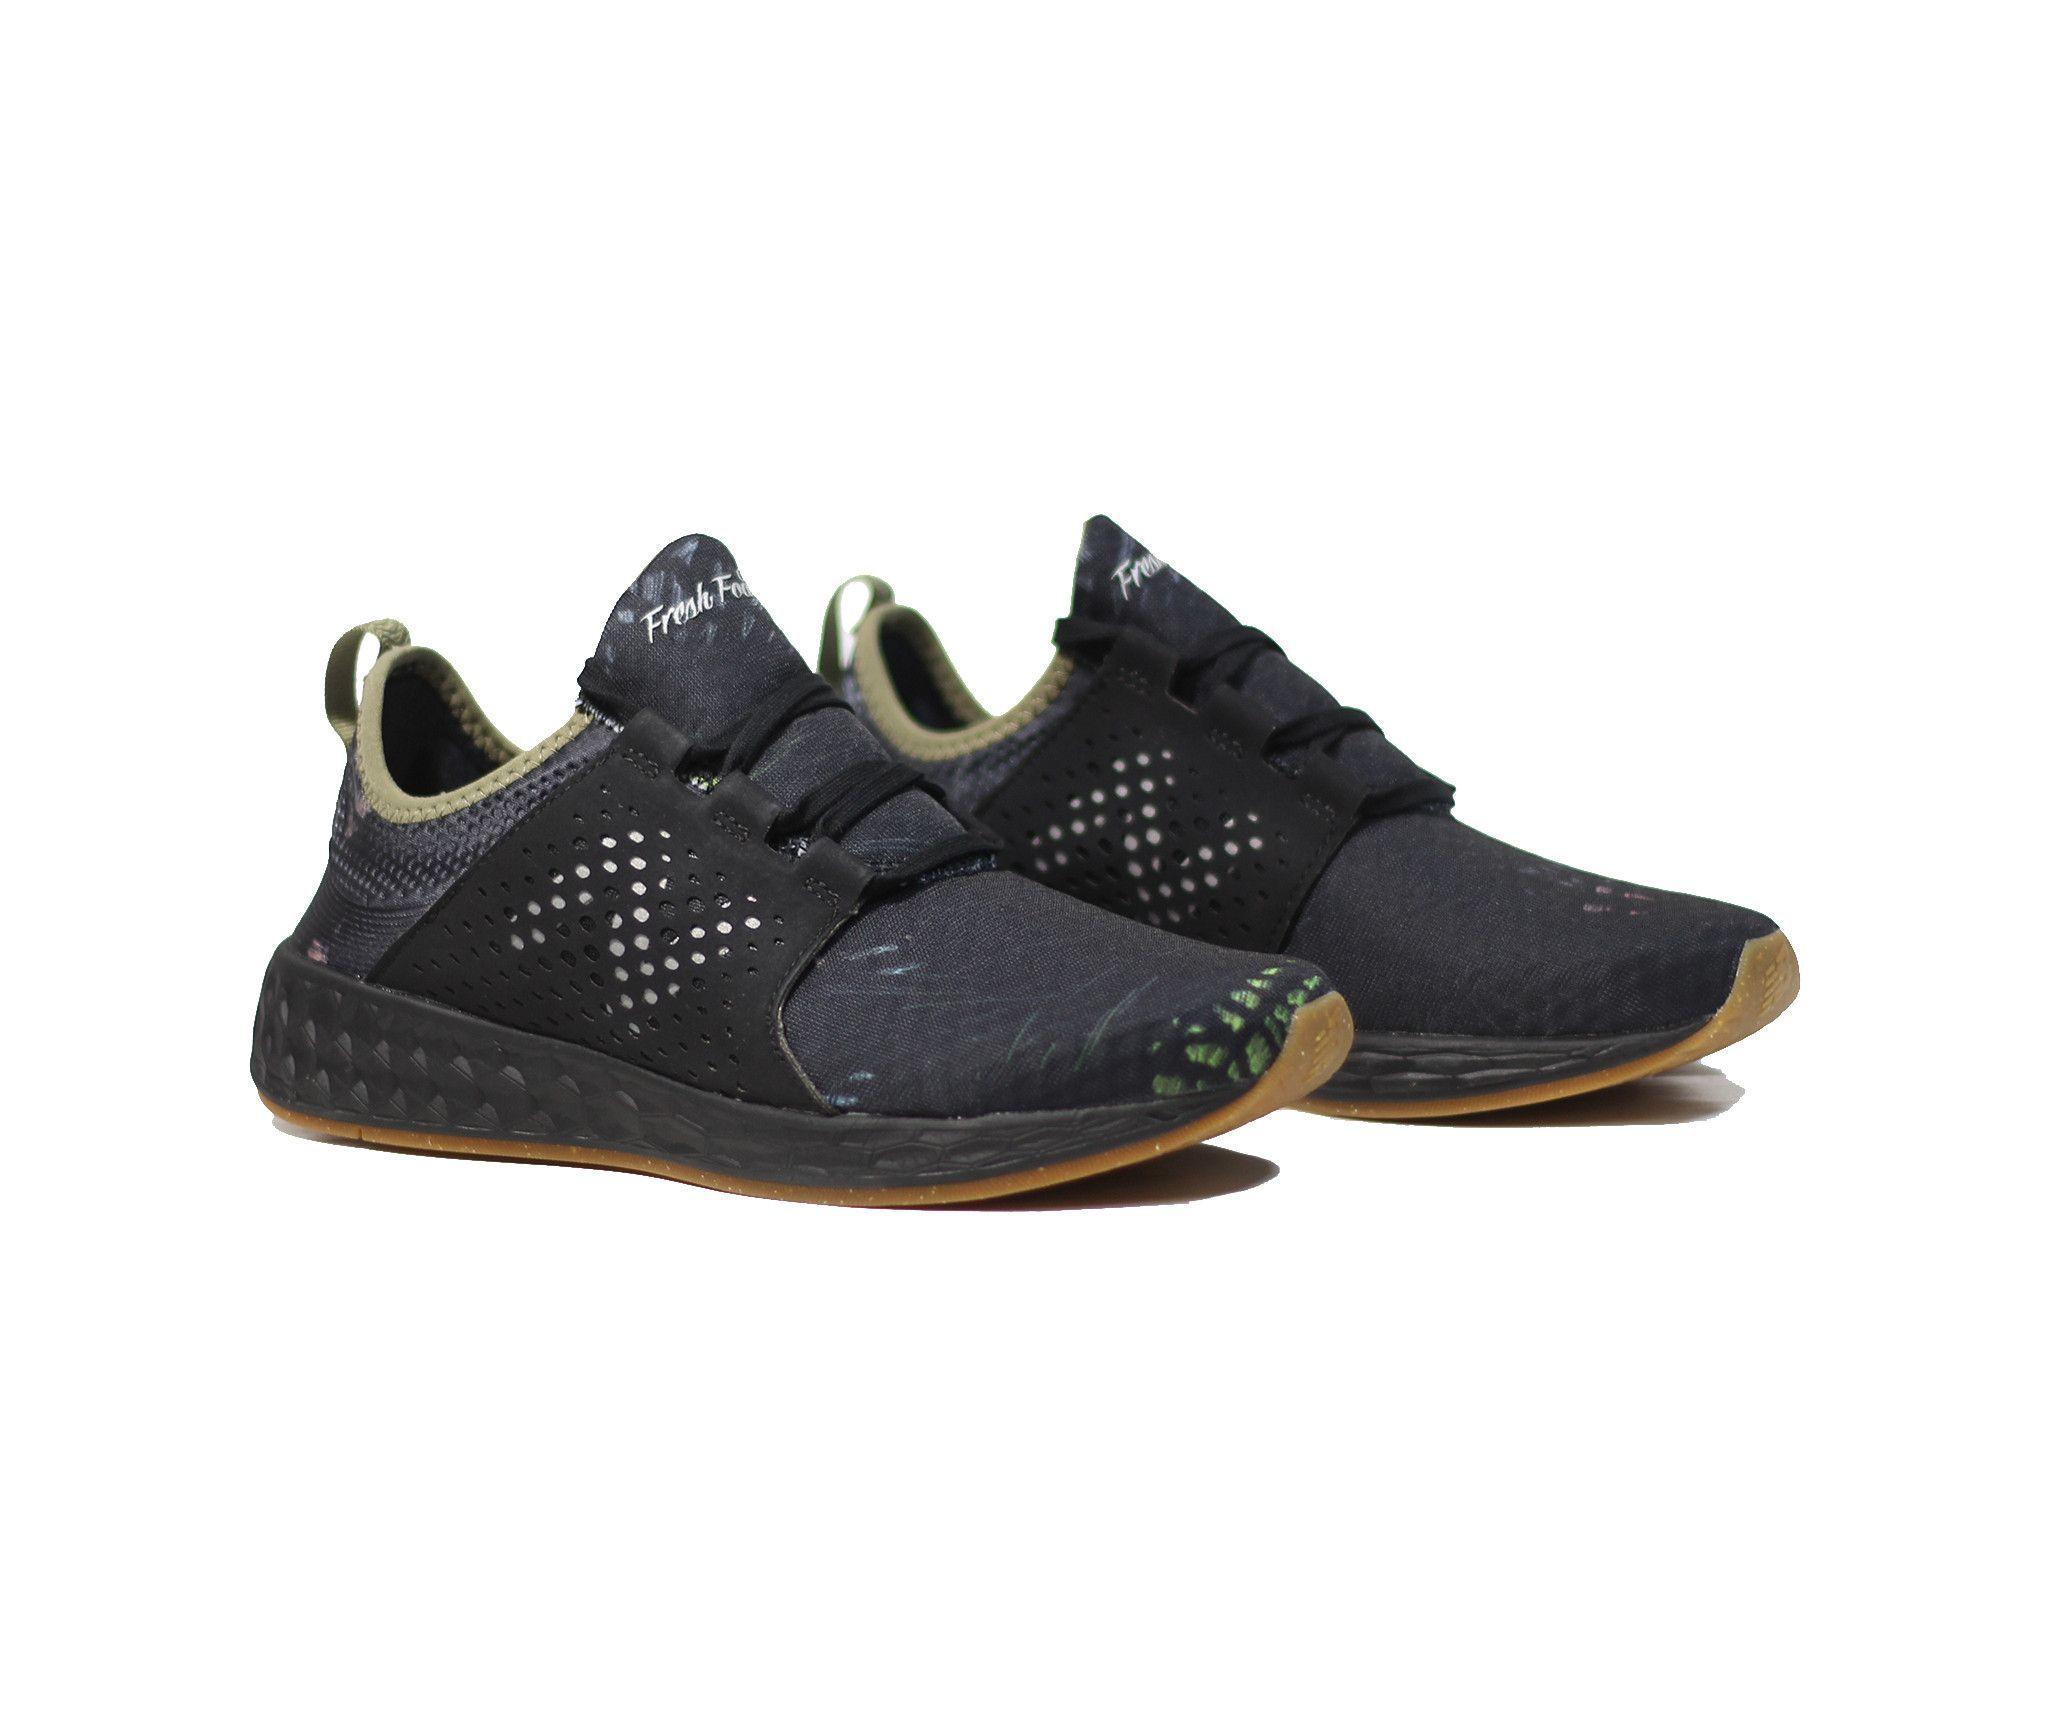 New Balance Fresh Foam Cruz - Black Graphite/Covert Green